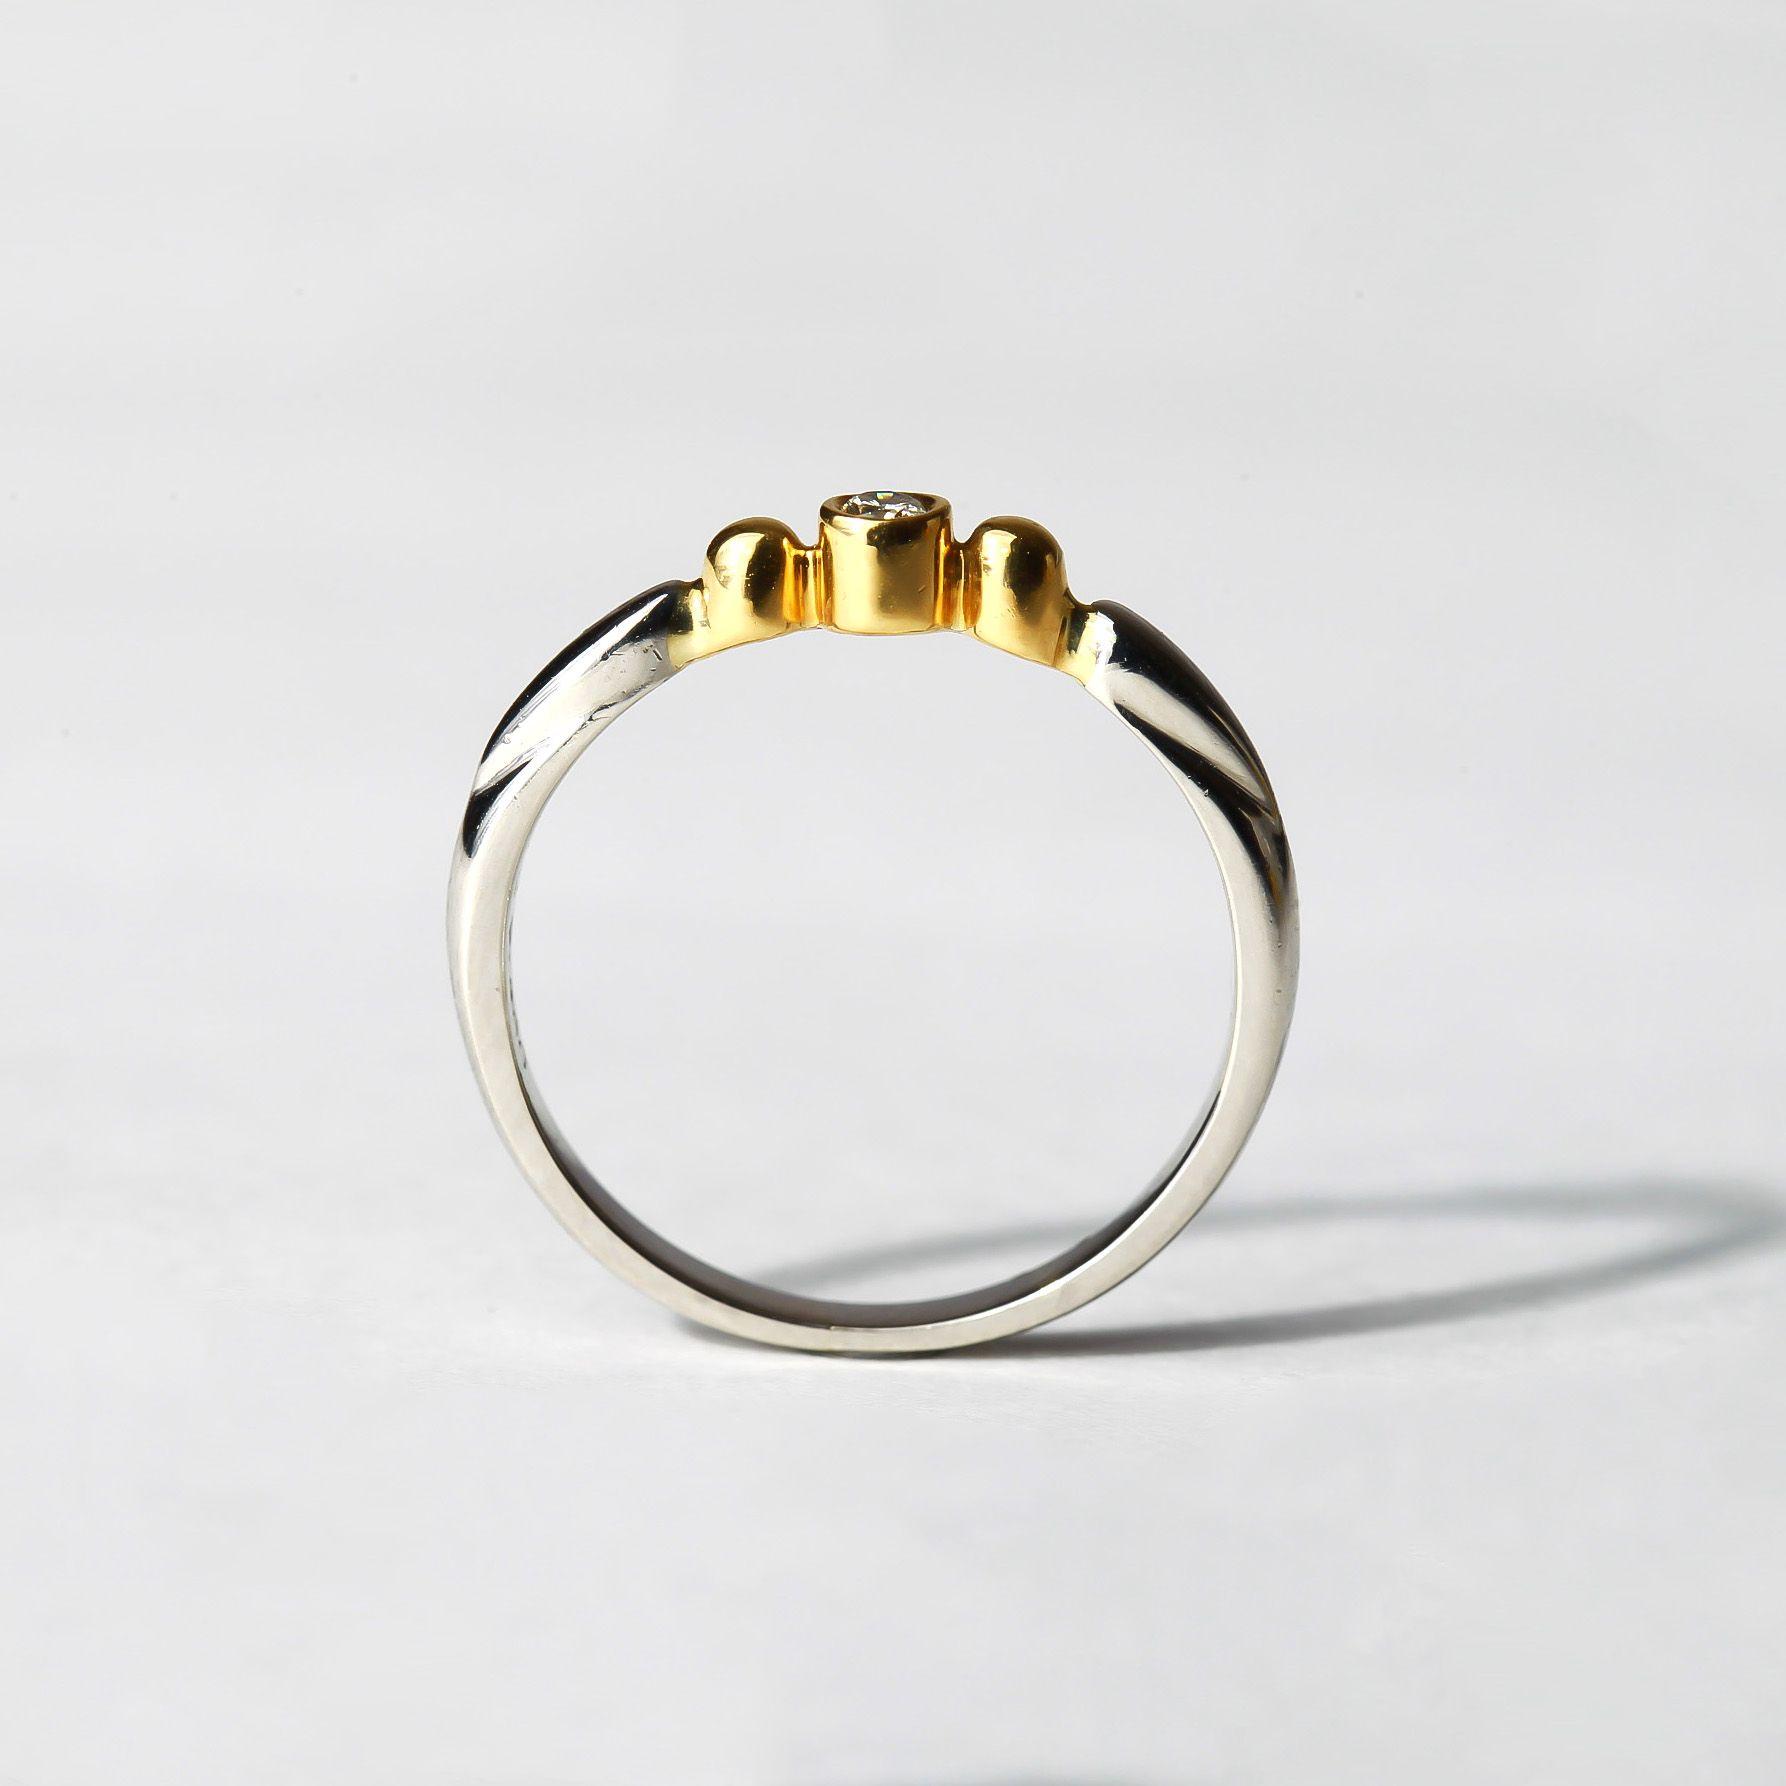 H nao ring k yellow gold white gold diamond jewelry sketch